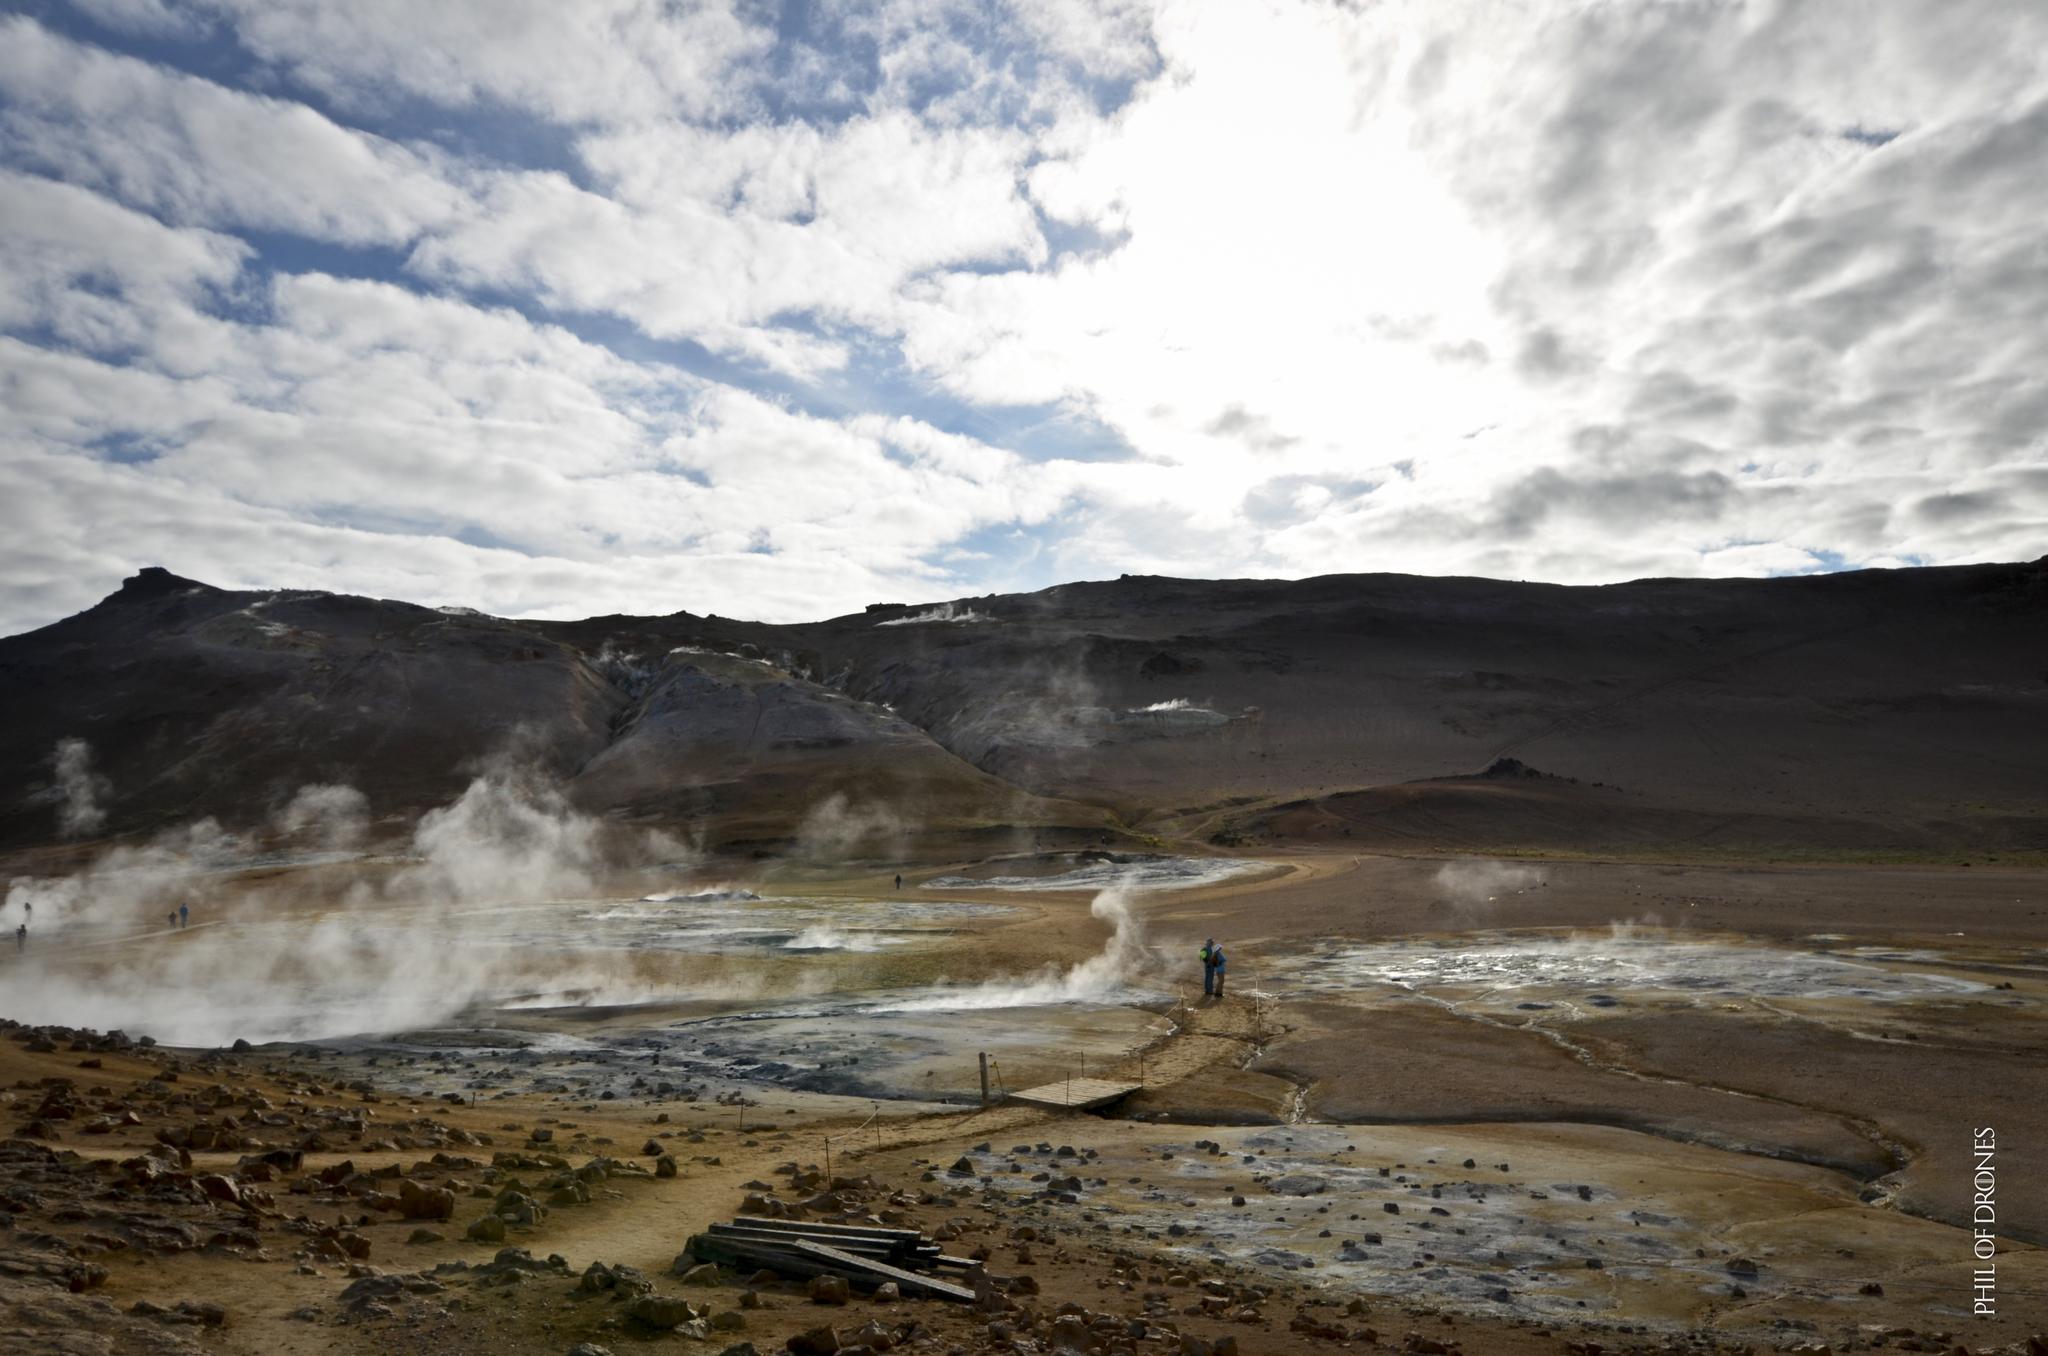 Islande 2013-1-PhM-3.jpg